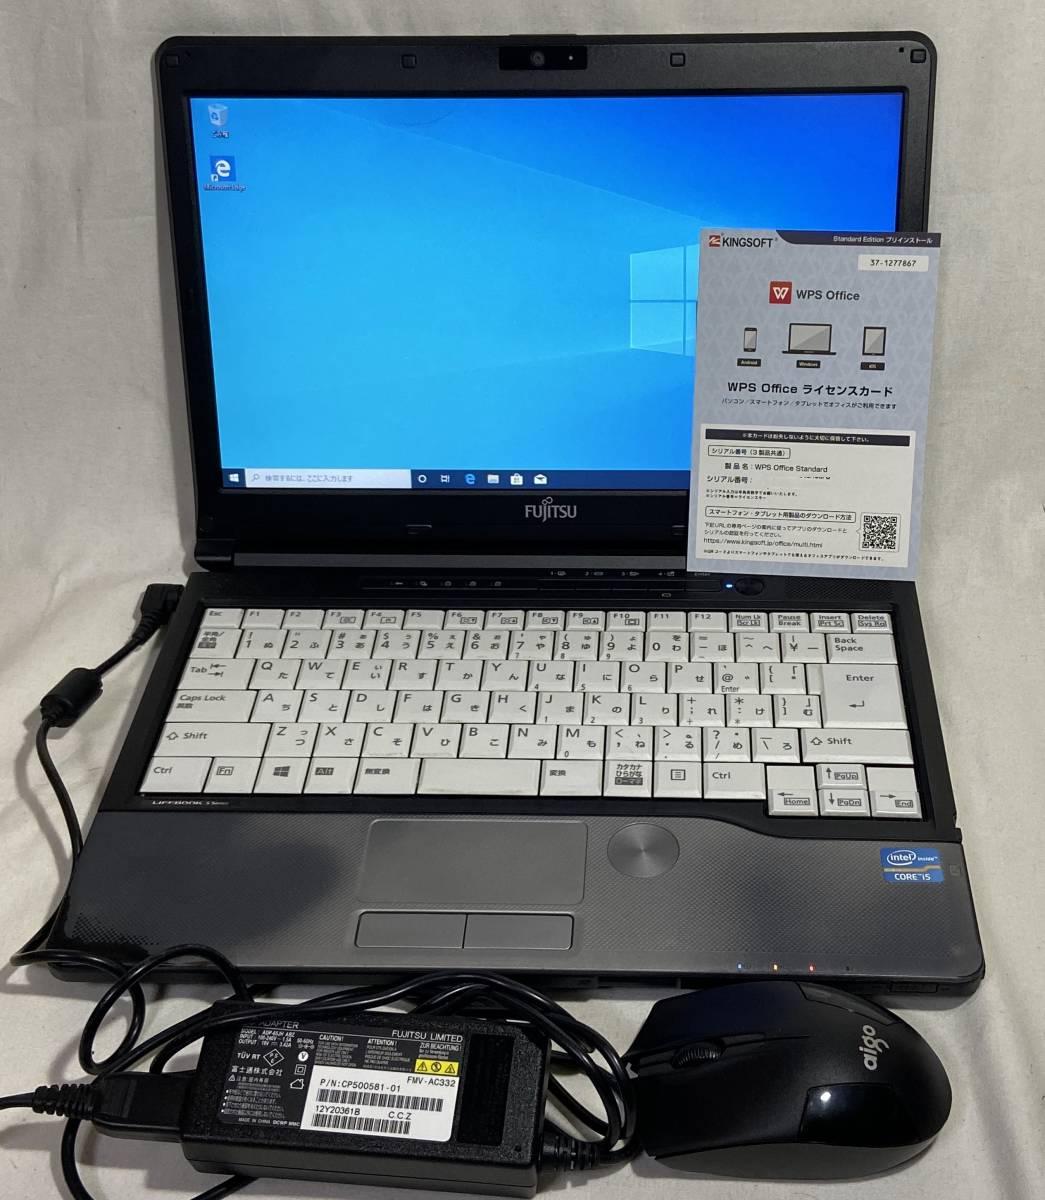 【中古/塗装難有】富士通 LIFEBOOK S762/G 13.3型 / Windows10 Pro/Core i5-3340M/メモリ4GB/120GB SSD/ドライブ有/WPS Office/カメラ認識_画像1